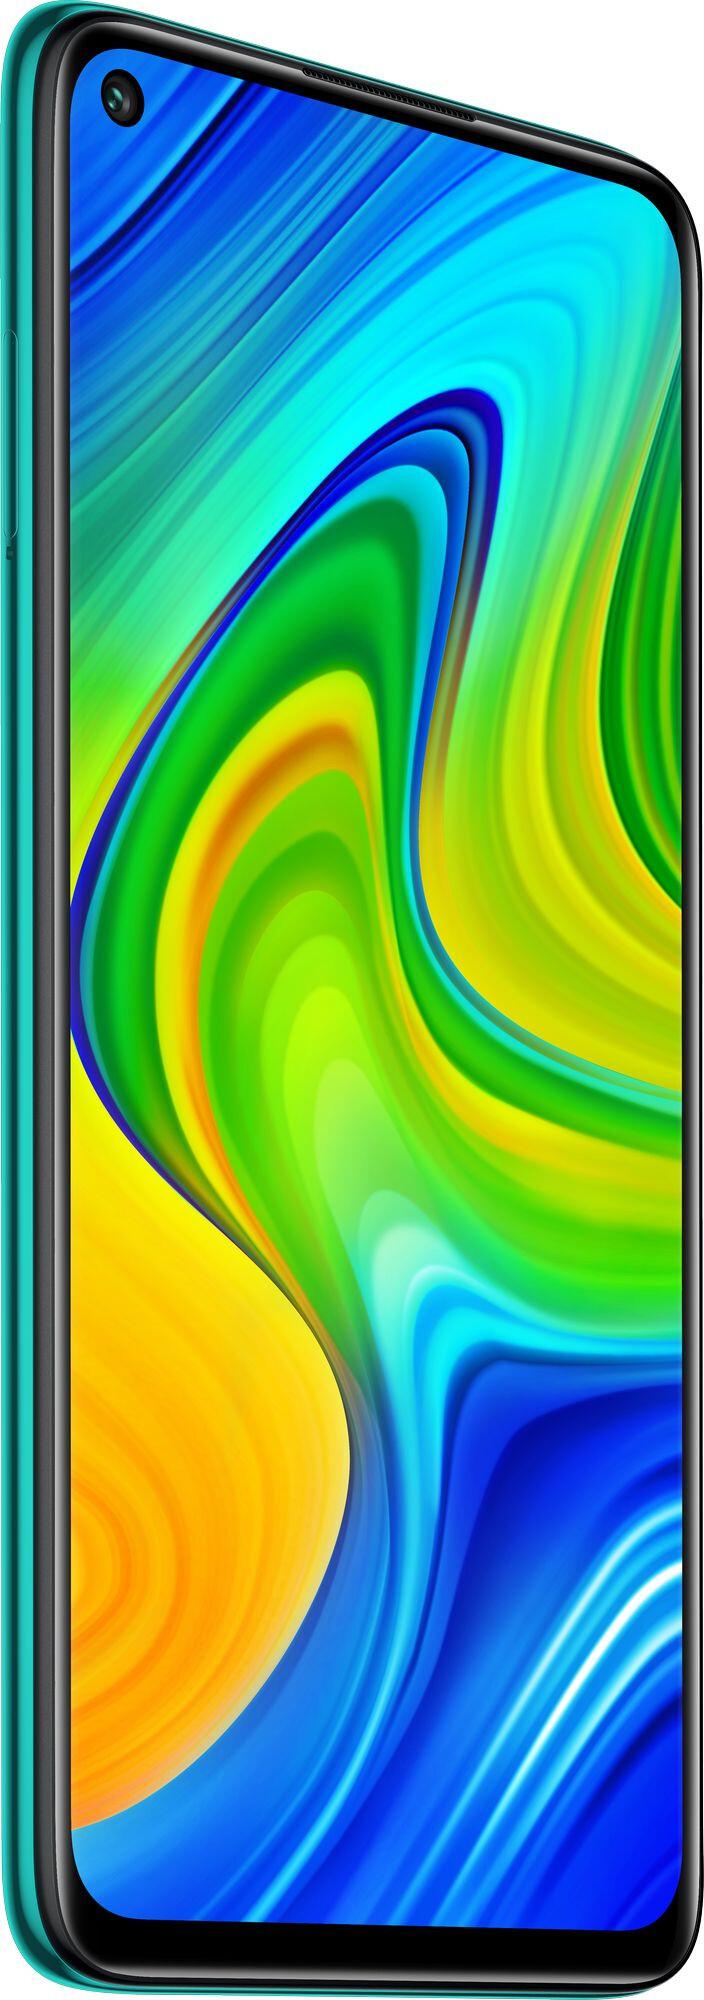 Xiaomi Redmi Note 9 3GB/64GB green - 2